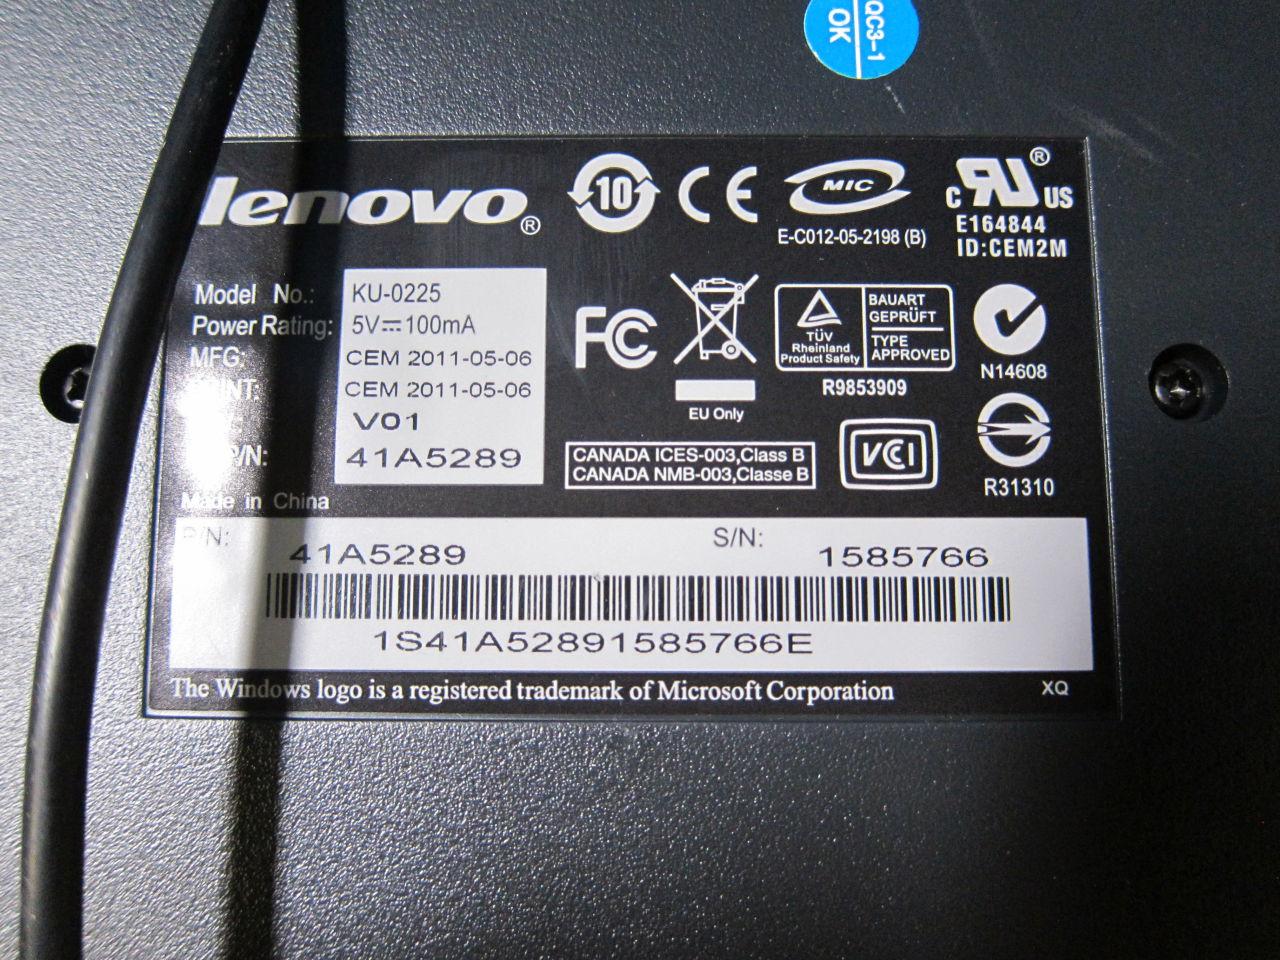 LENOVO L1900PA w/ Keyboard - Lot of 2 Display Monitor